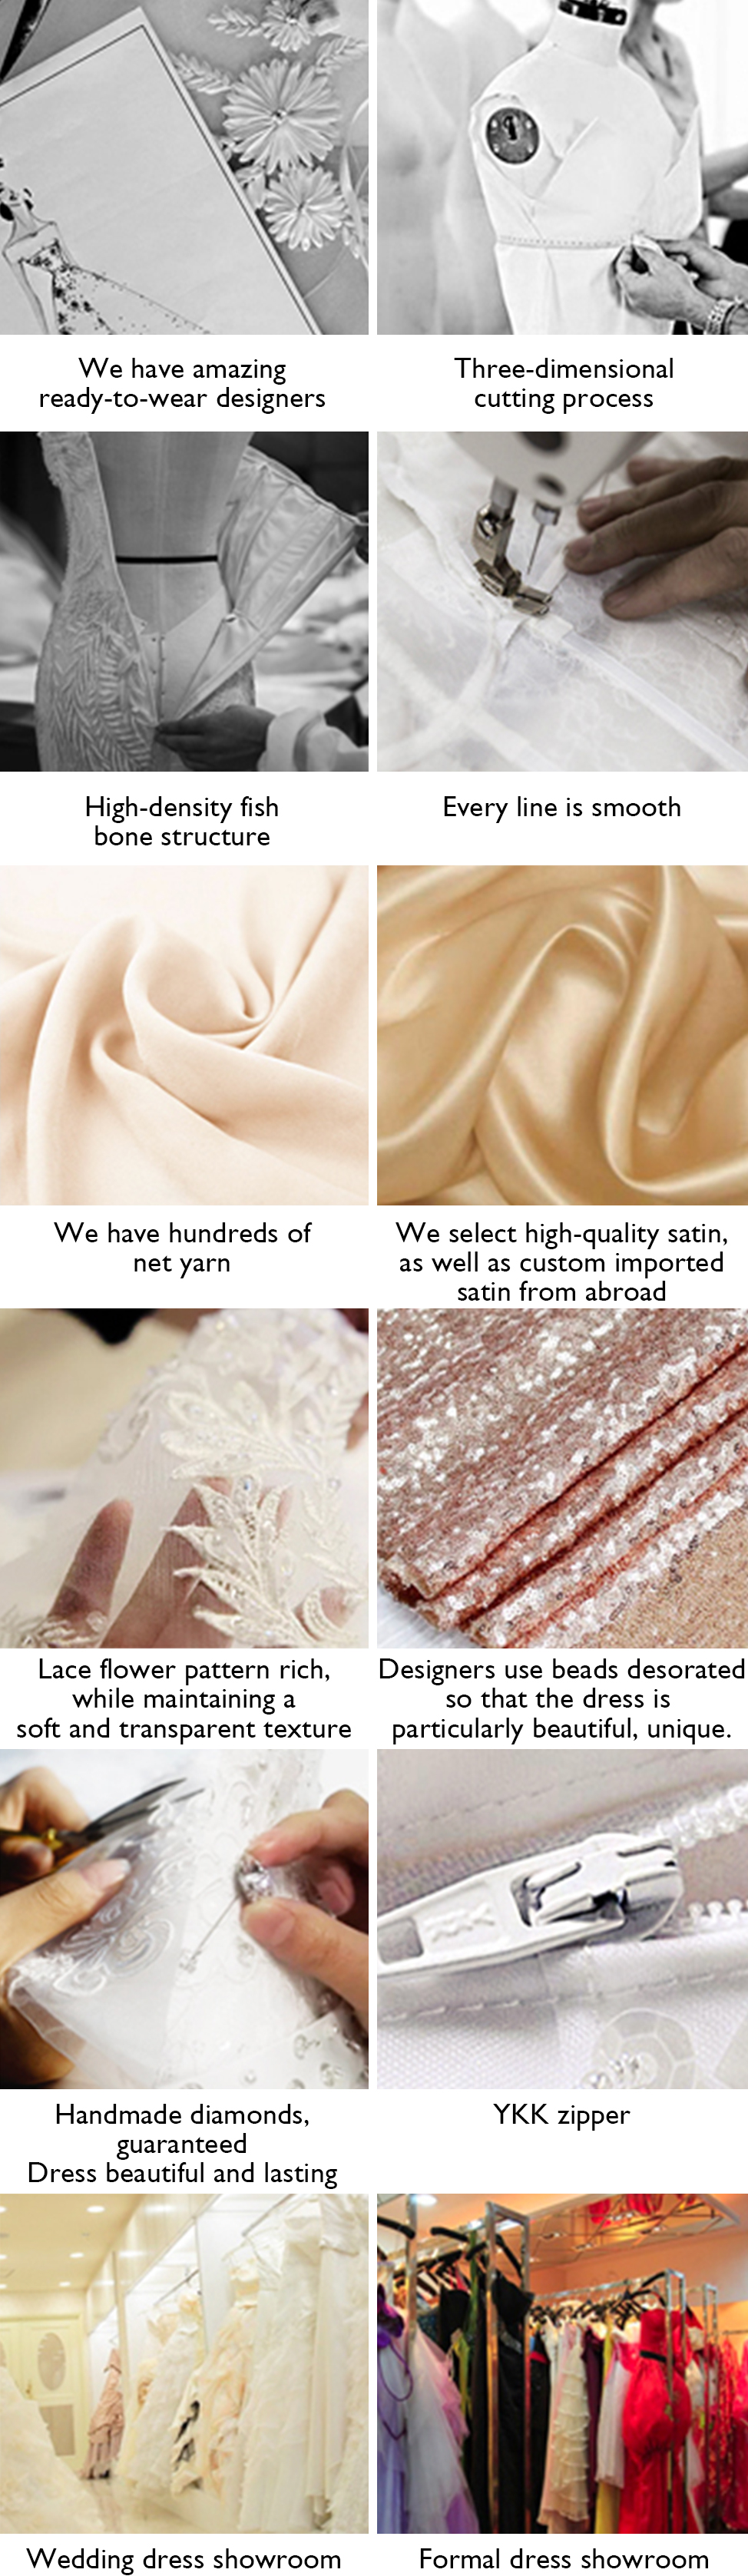 Duchesse-Linie Ärmellos Spaghettiträger Sweep/Pinsel Zug Applikation Tülle  Kleider